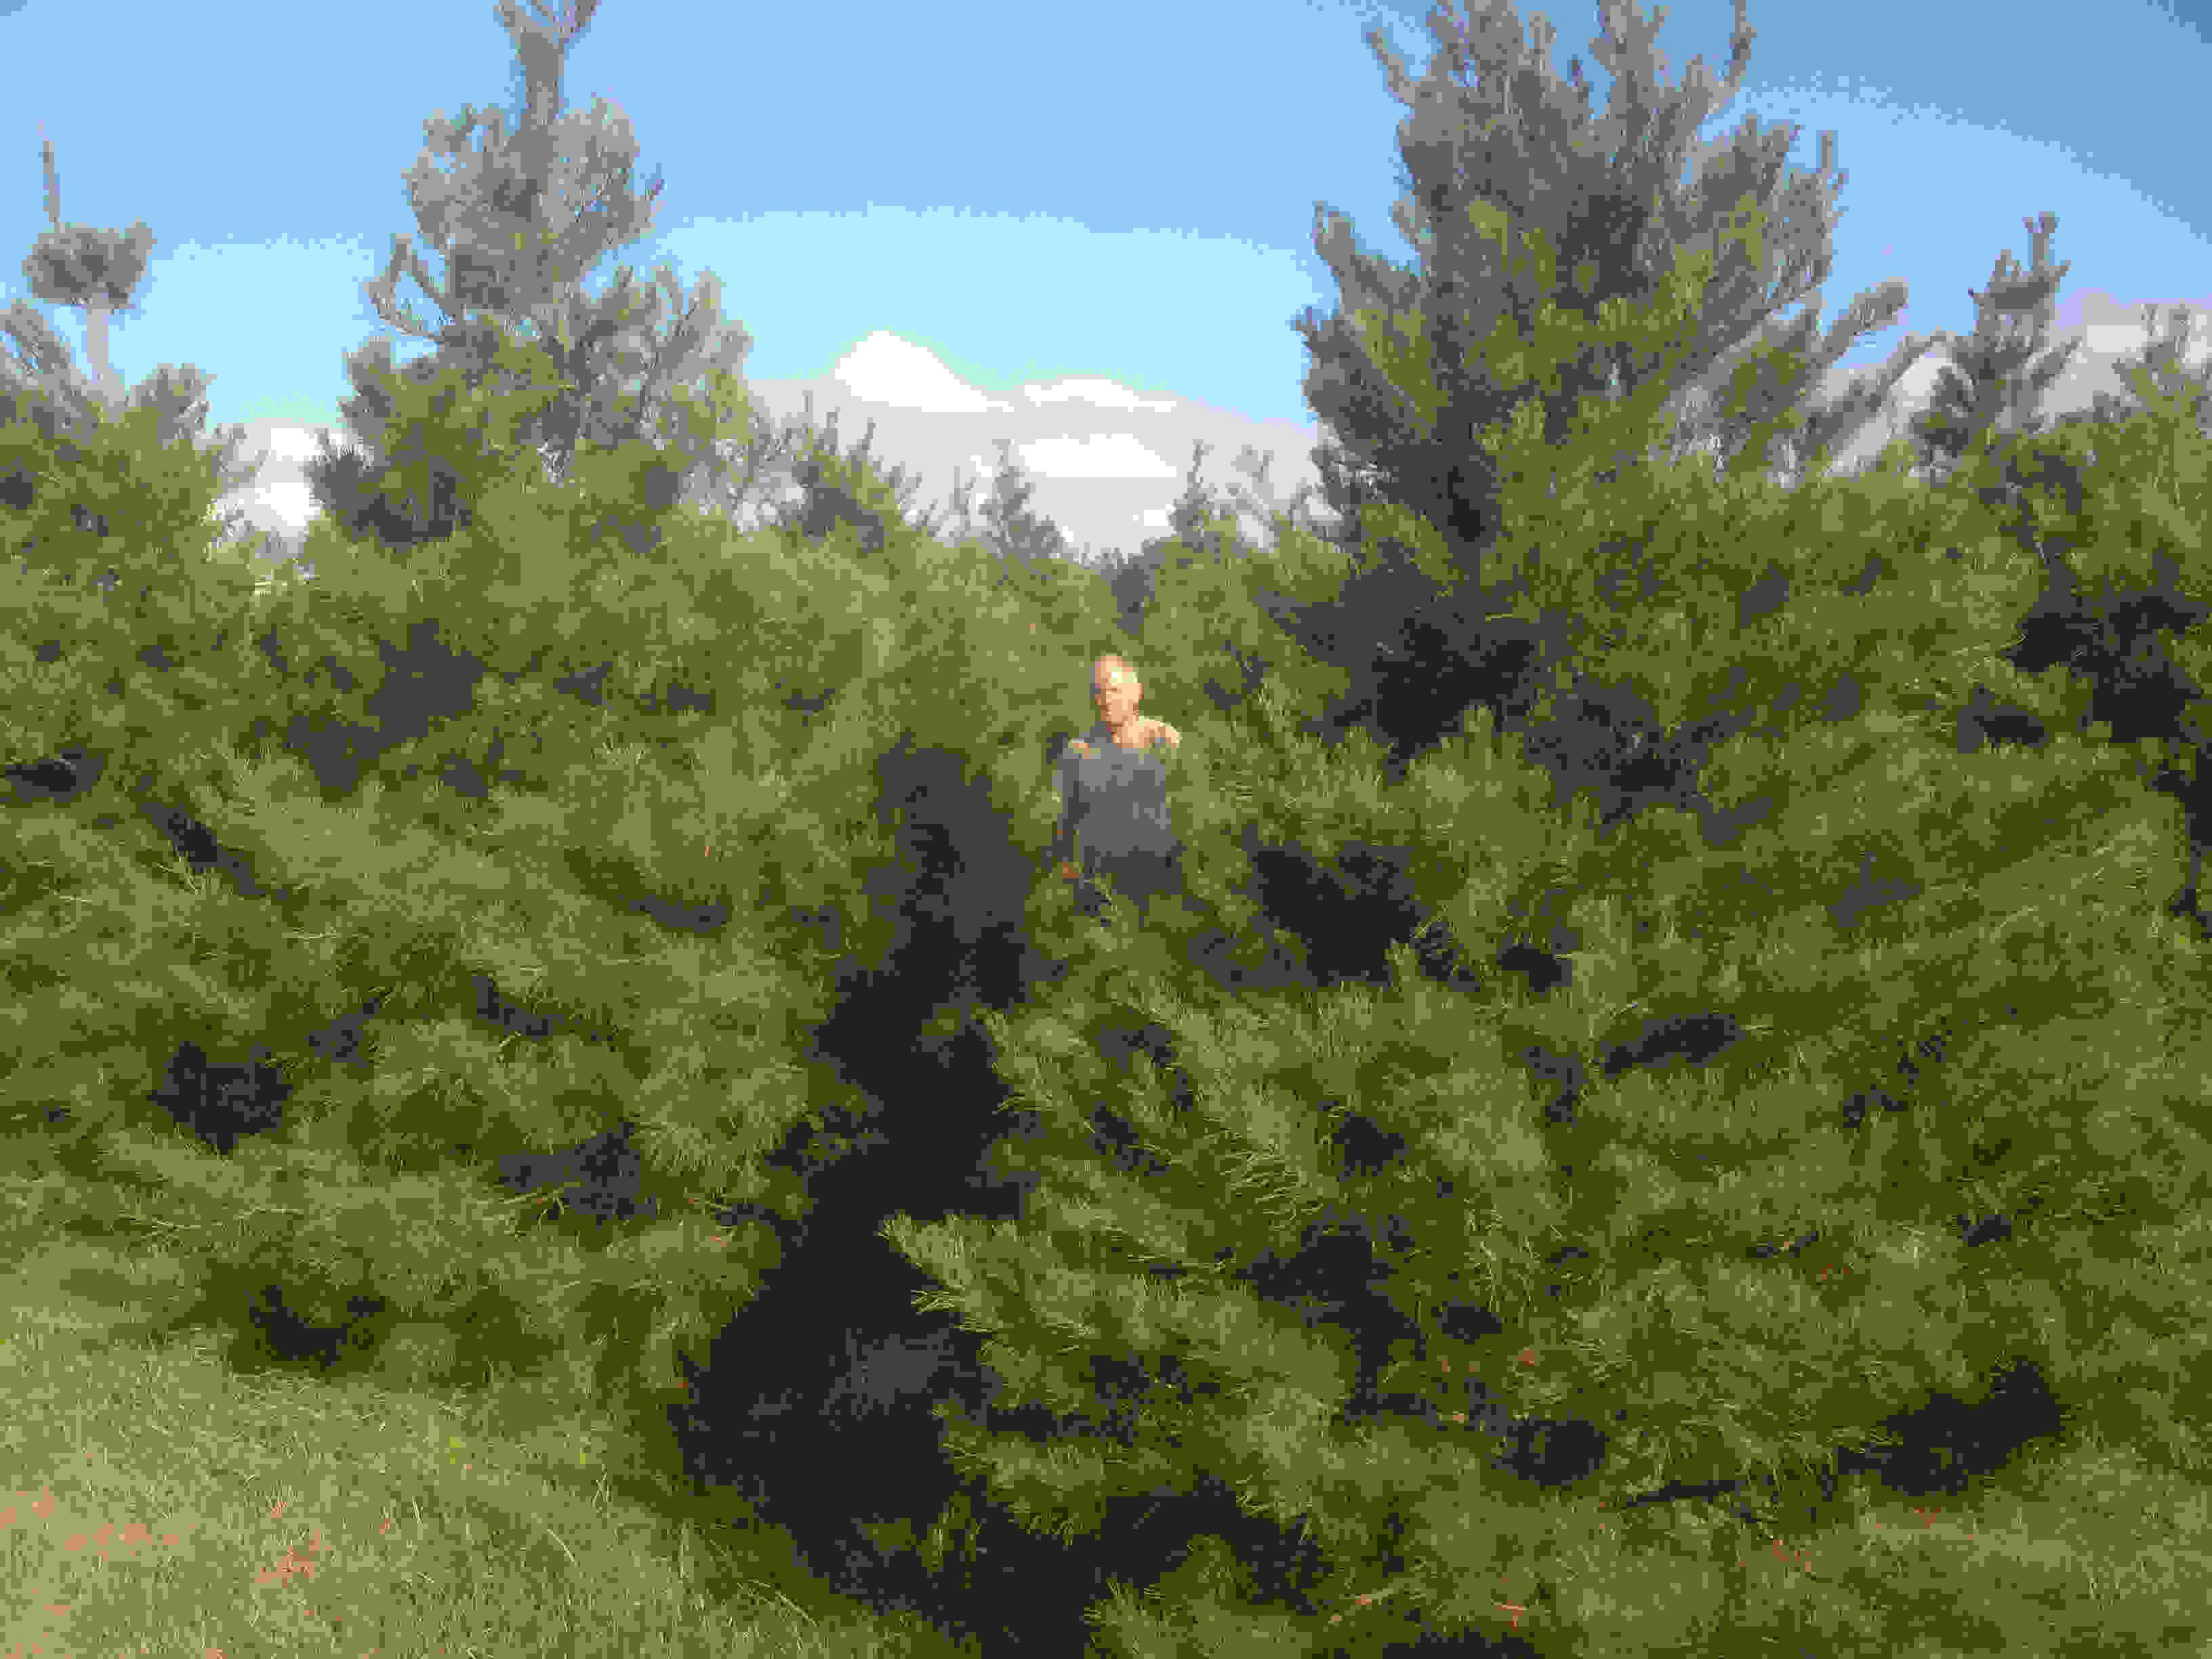 Brushy Creek Christmas Trees